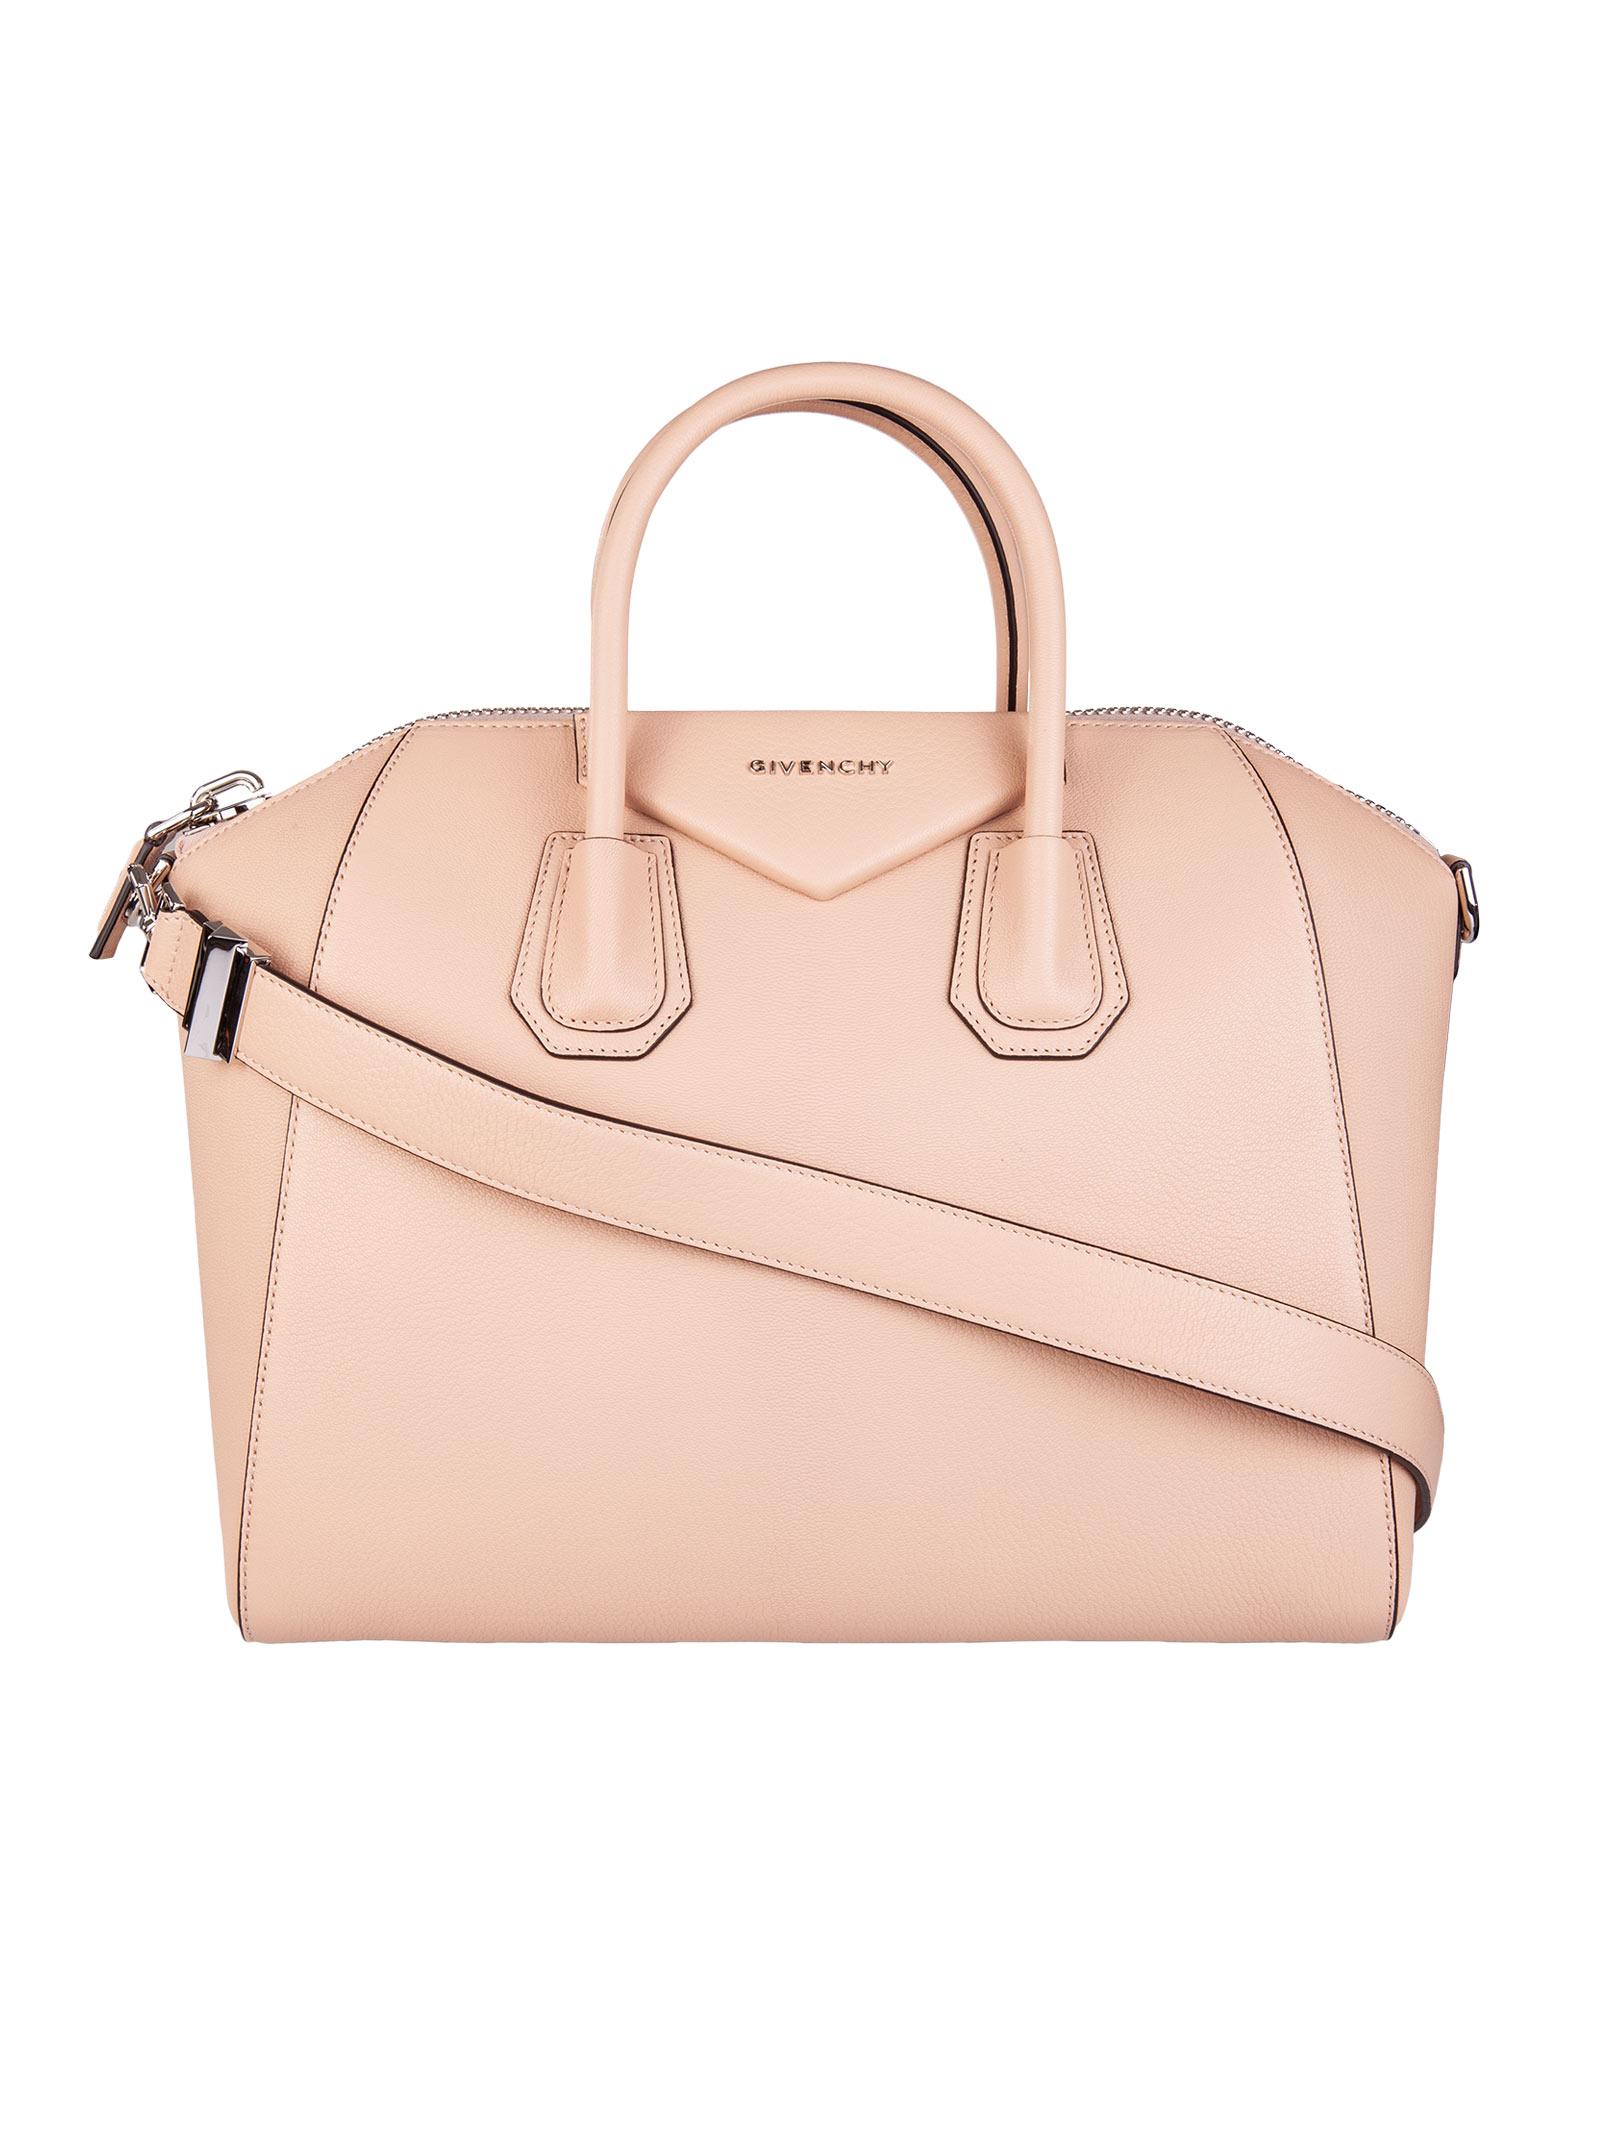 48dce001db Borsa a mano Givenchy - Givenchy - Michele Franzese Moda